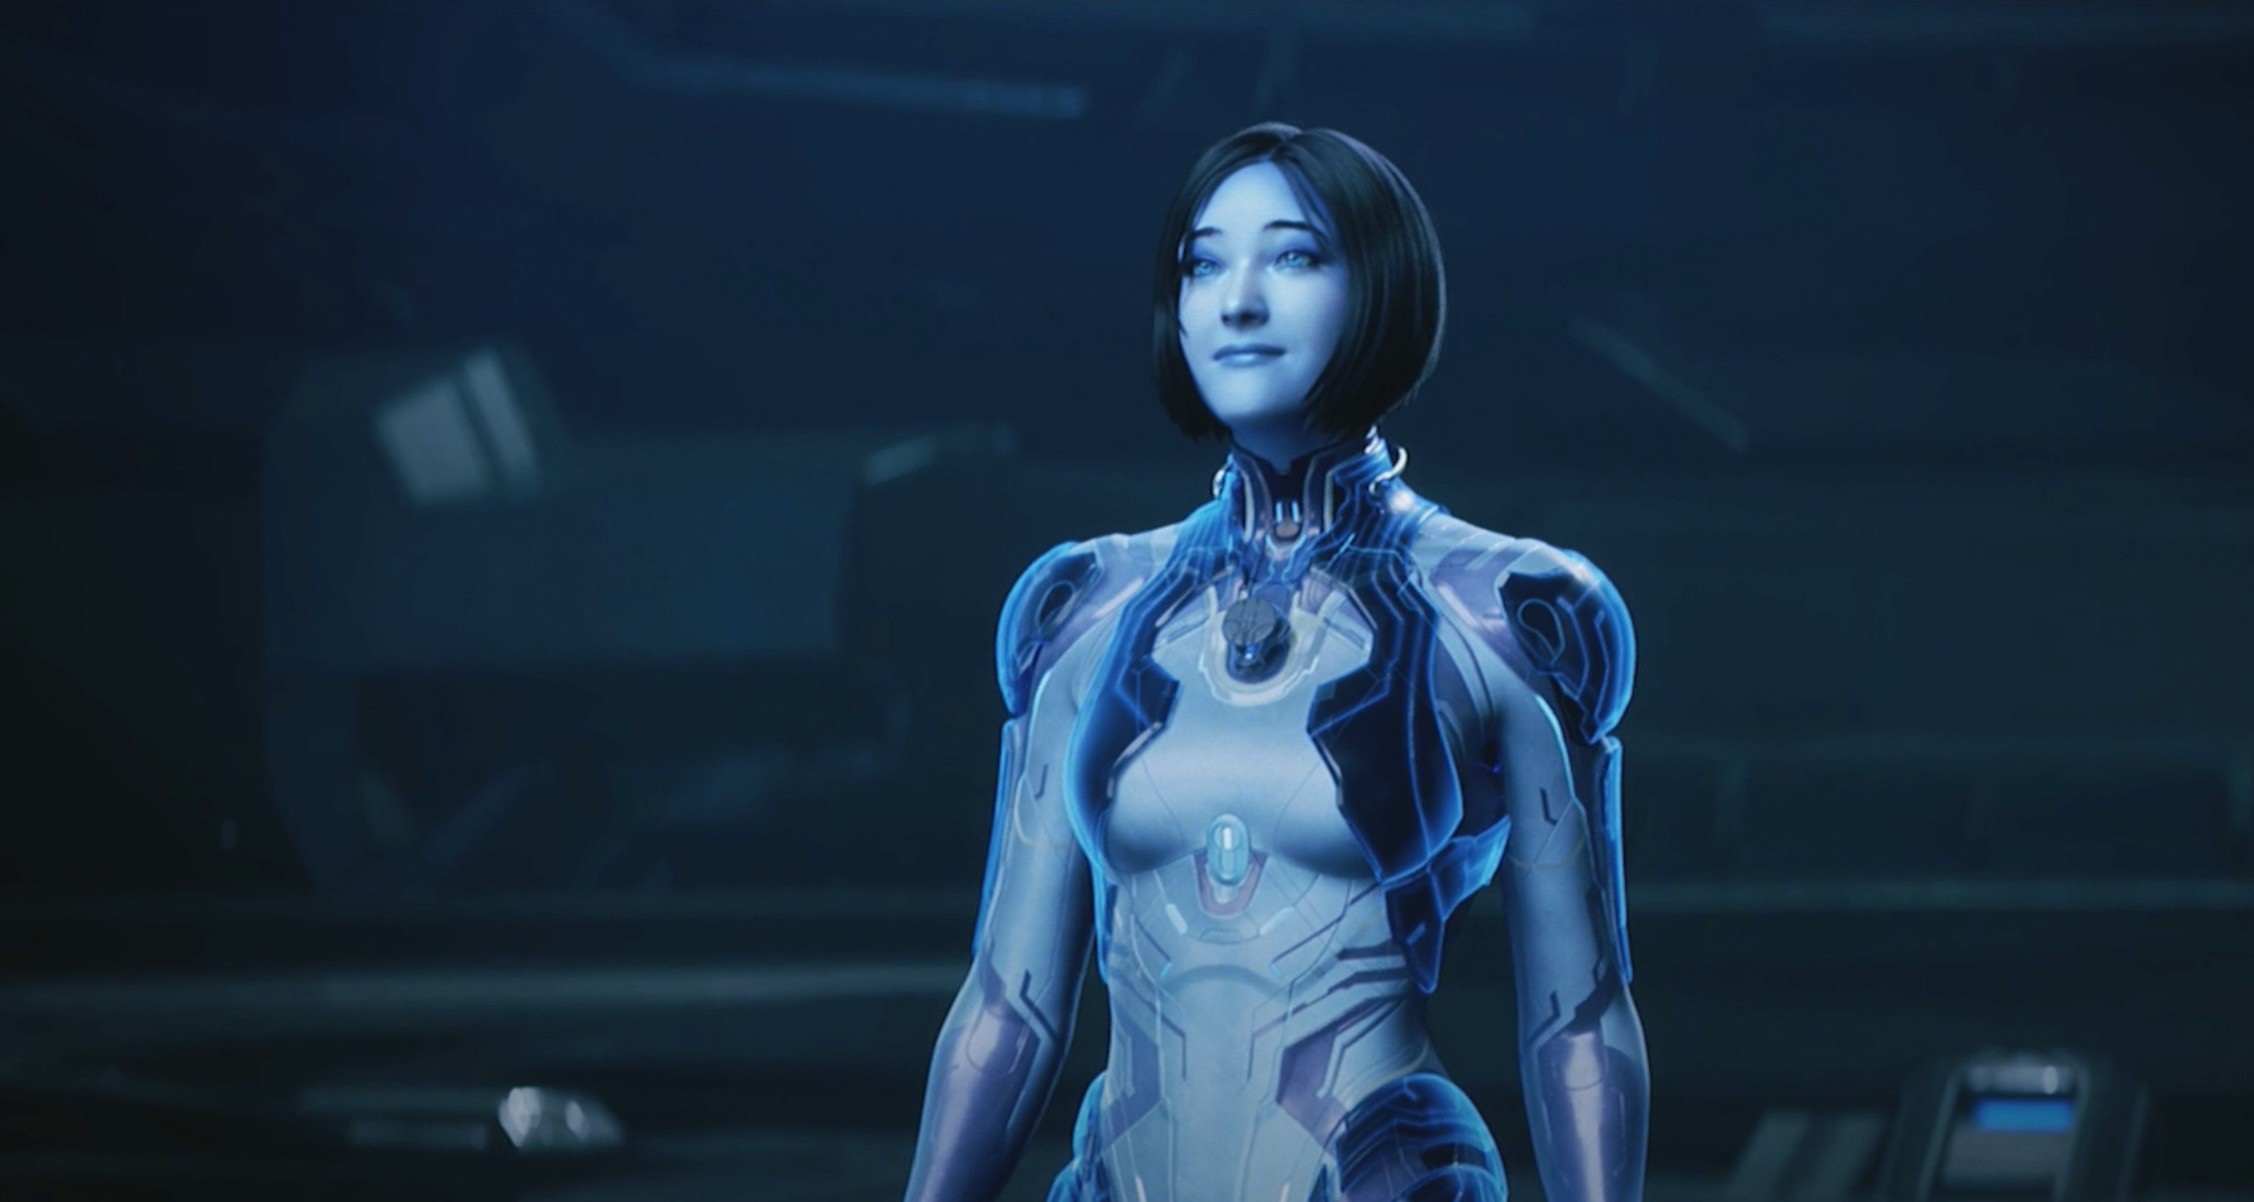 Cortana pornografГa imagenes hd porncraft video